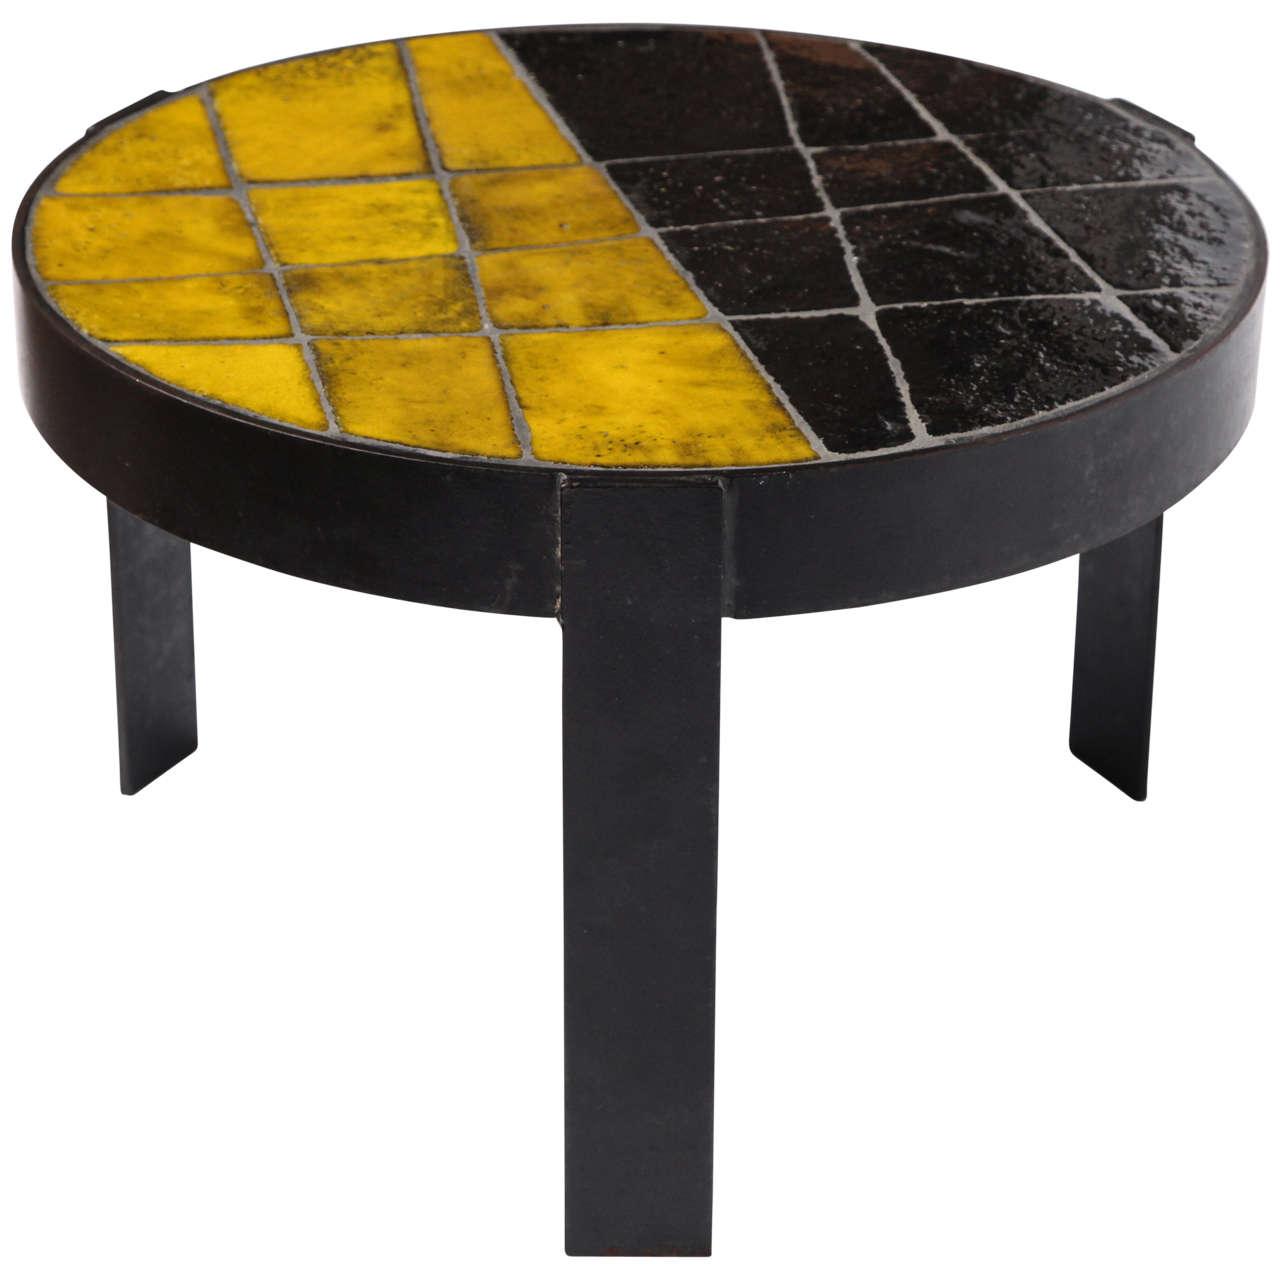 Ceramic tile table top